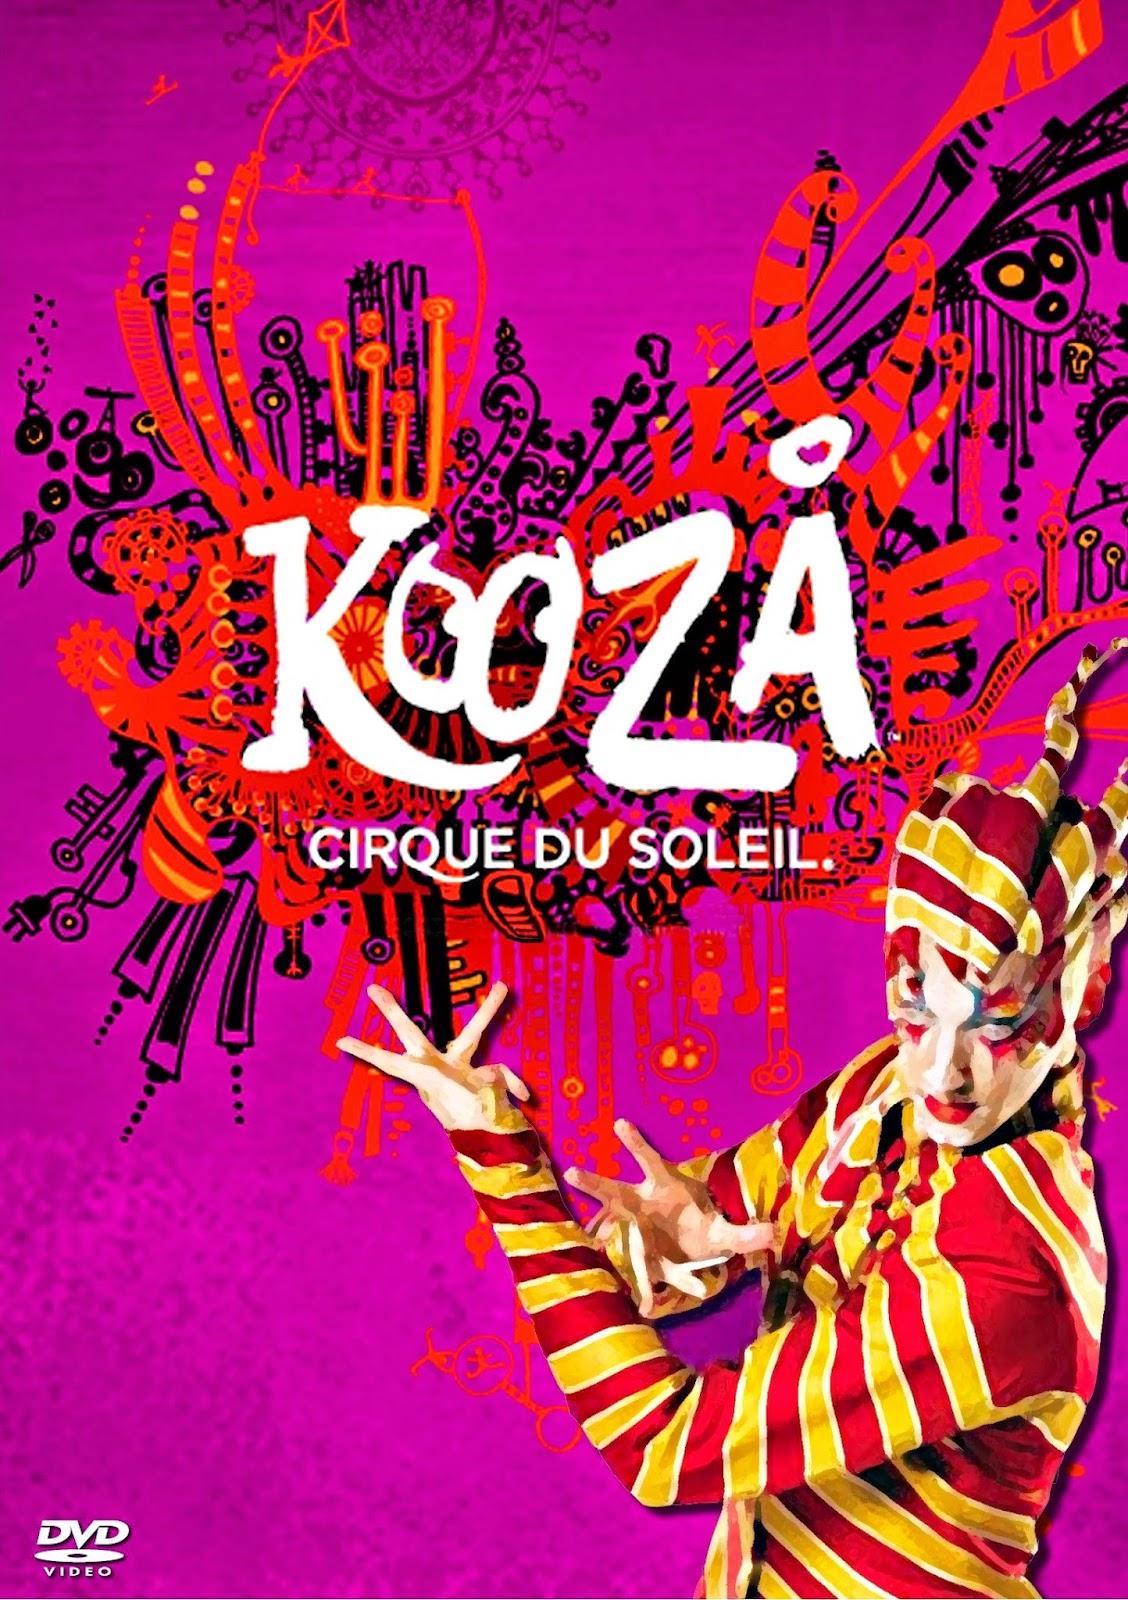 Cirque du Soleil: Kooza (2007)